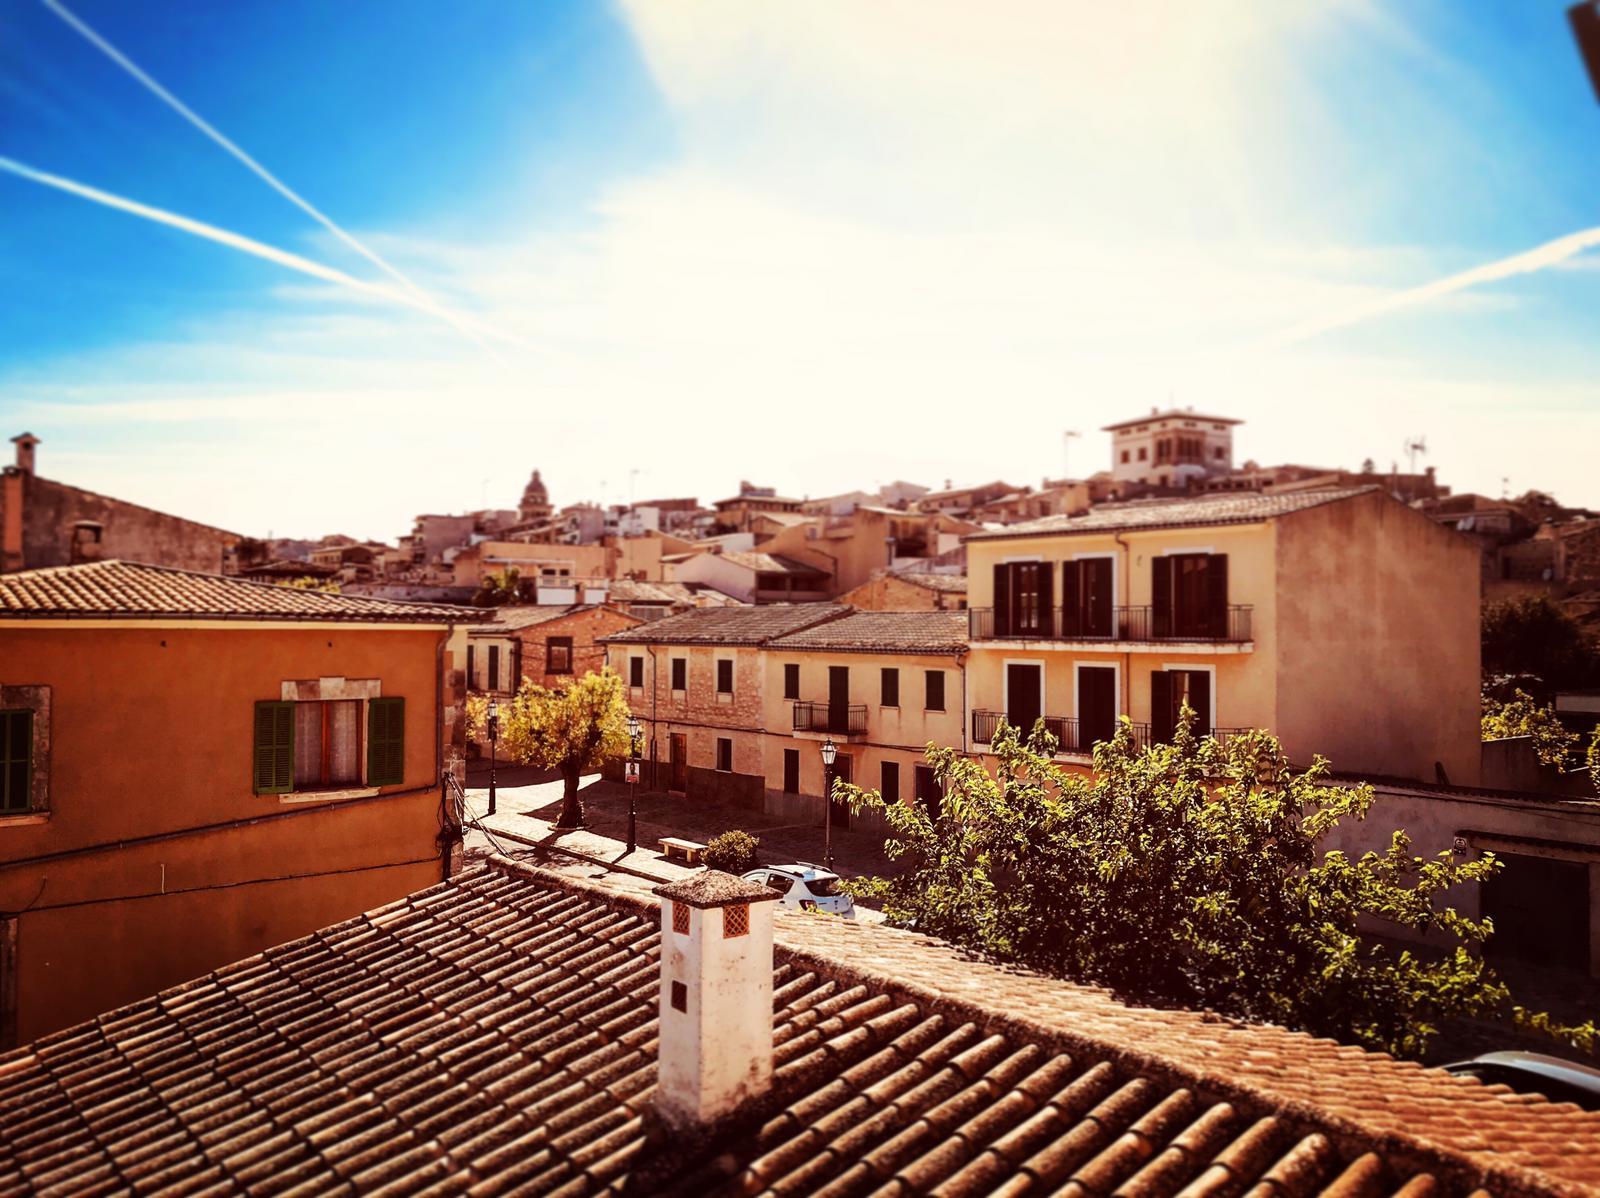 Mallorca-dächer-sommer-seehund-media